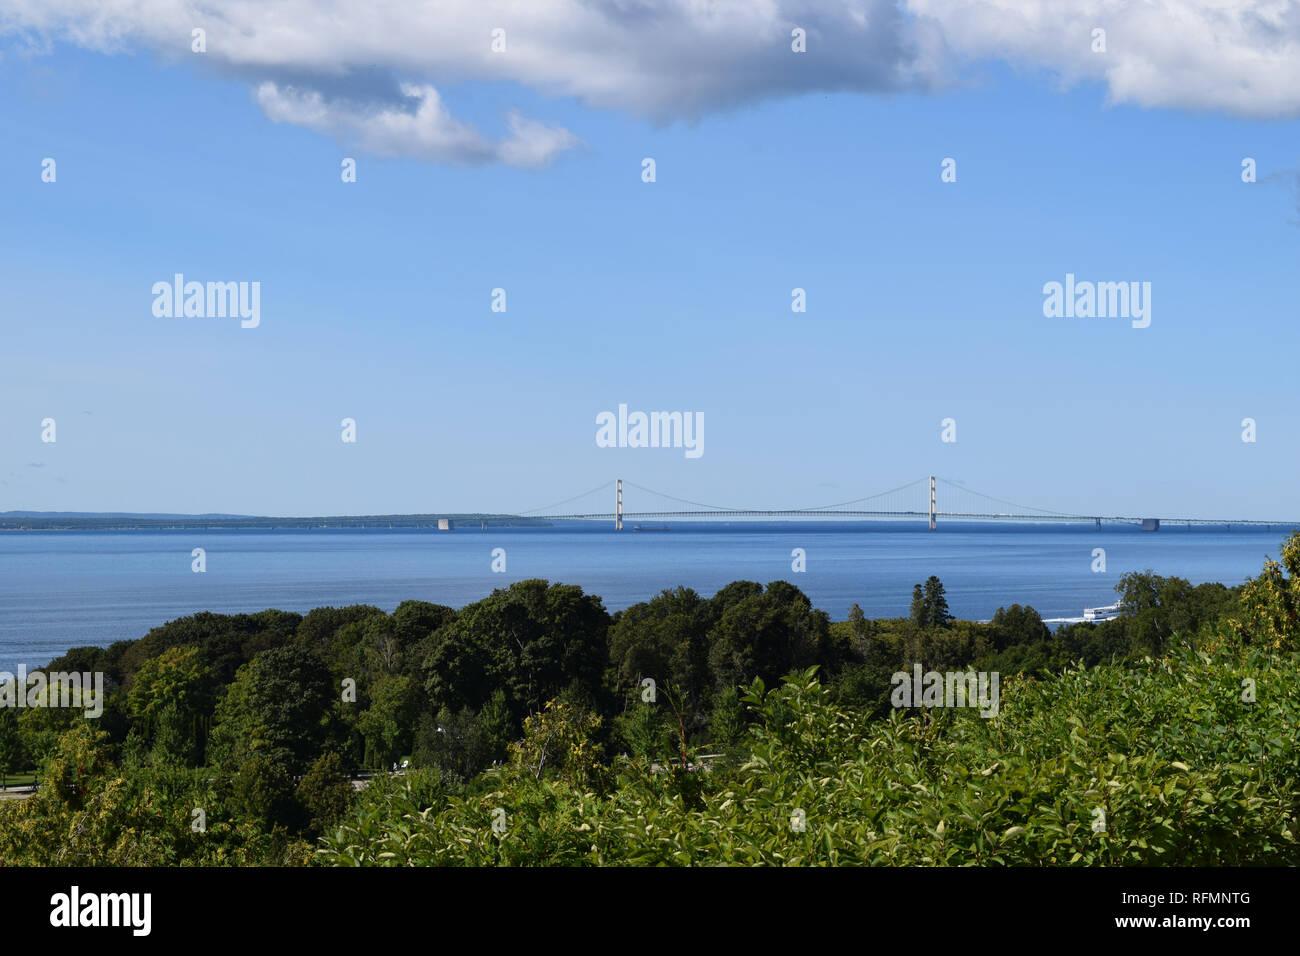 Mackinac Island September 2016 - Stock Image